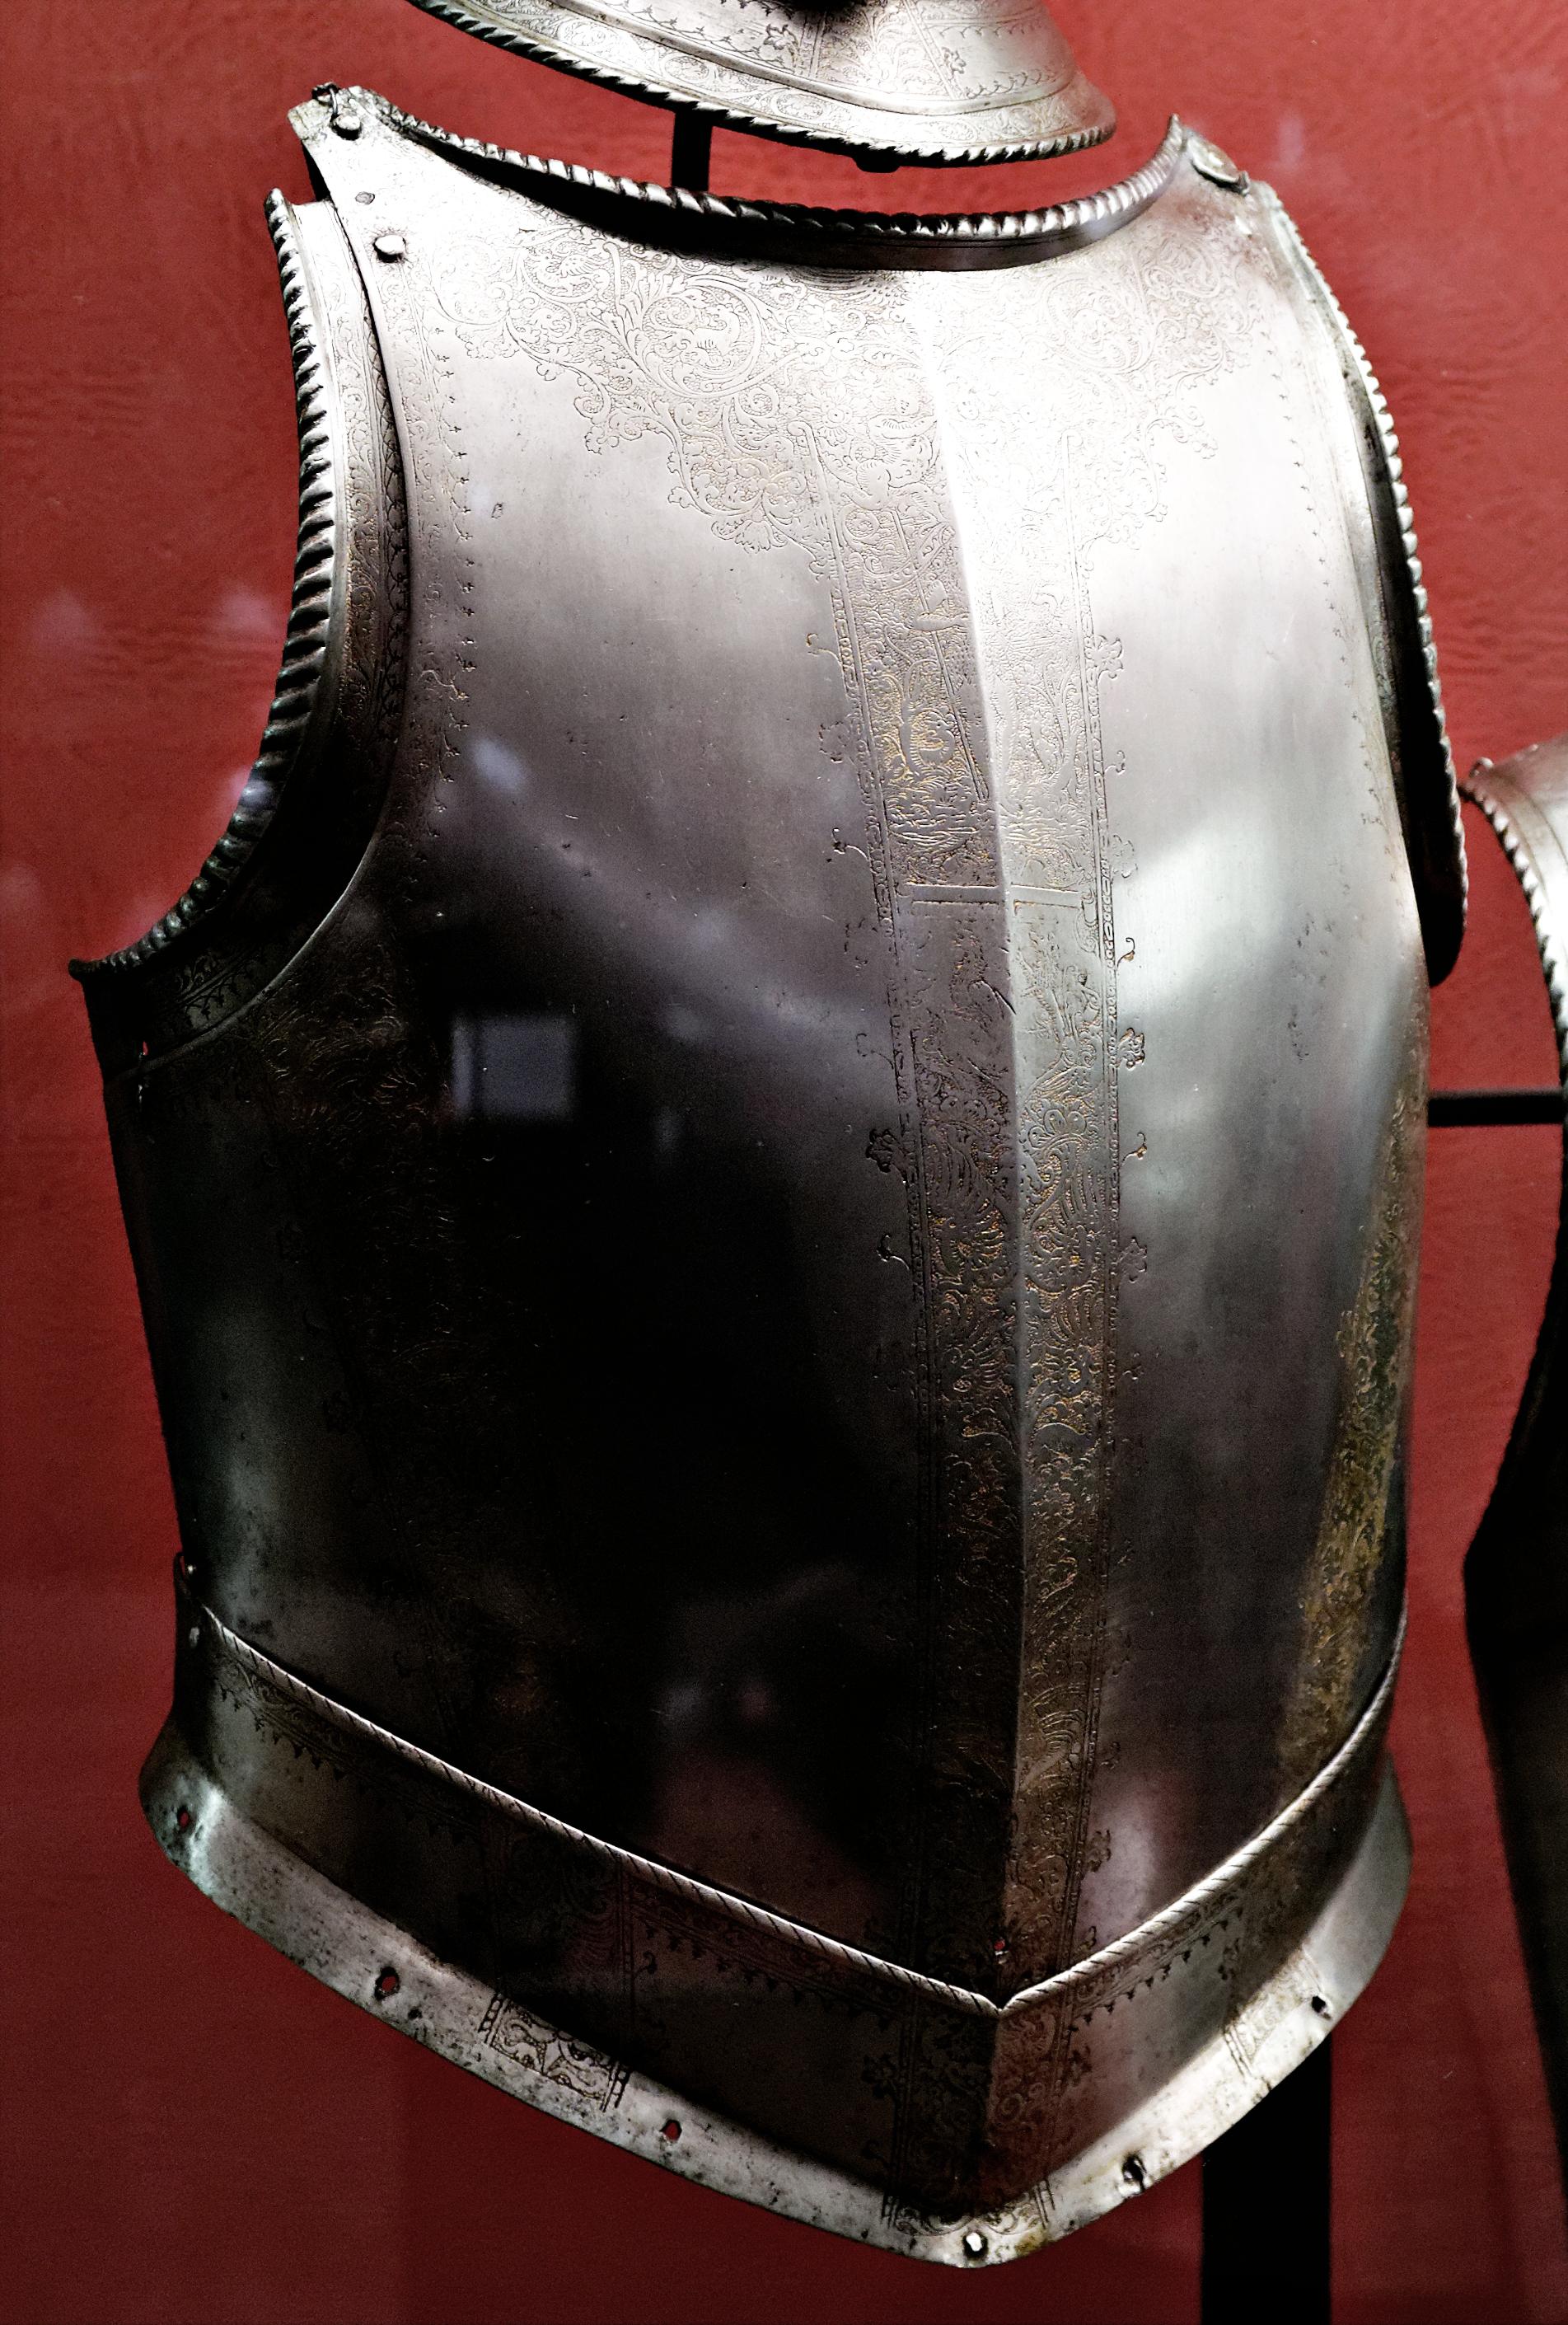 file armour of jean parisot de la valette palace armoury valletta n01 wikimedia. Black Bedroom Furniture Sets. Home Design Ideas